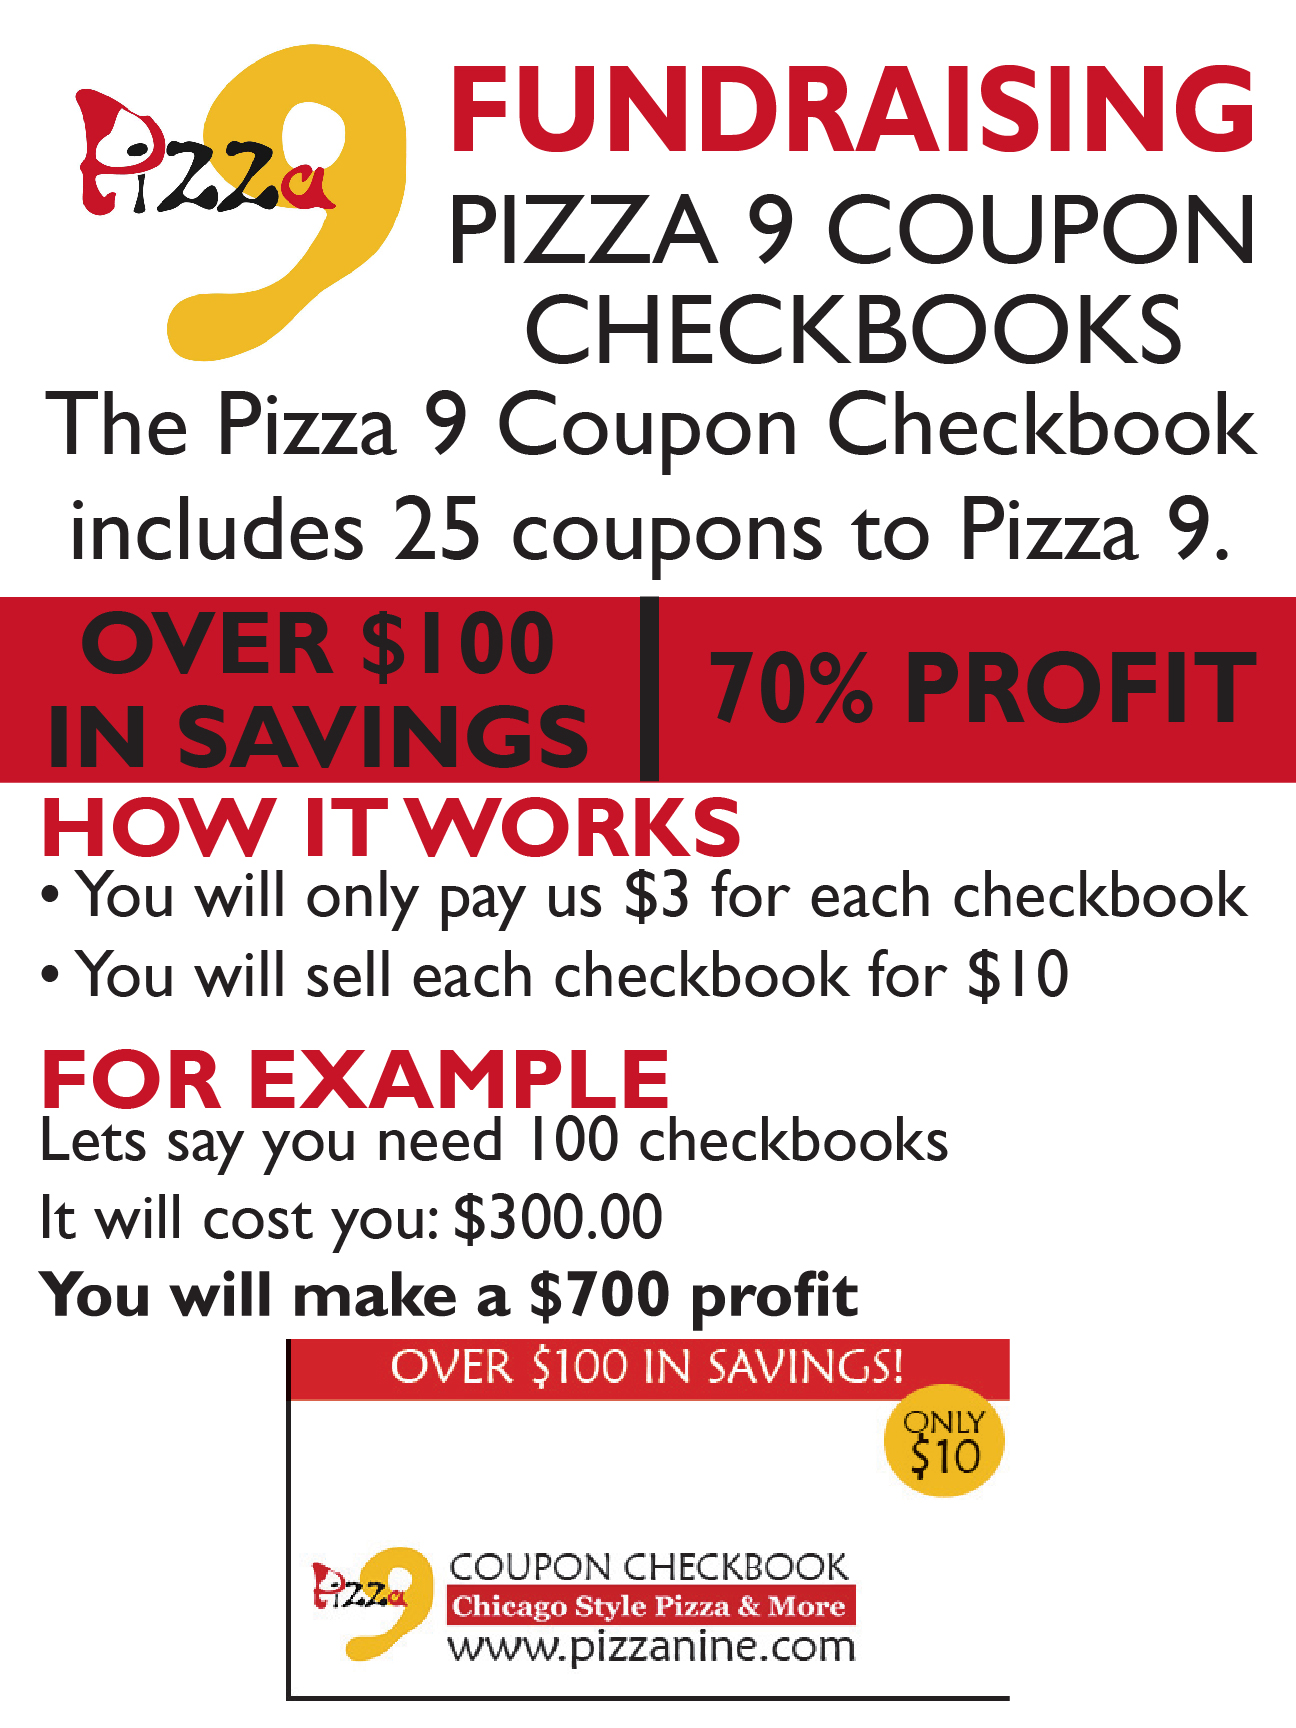 Coupon Checkbooks-100.jpg